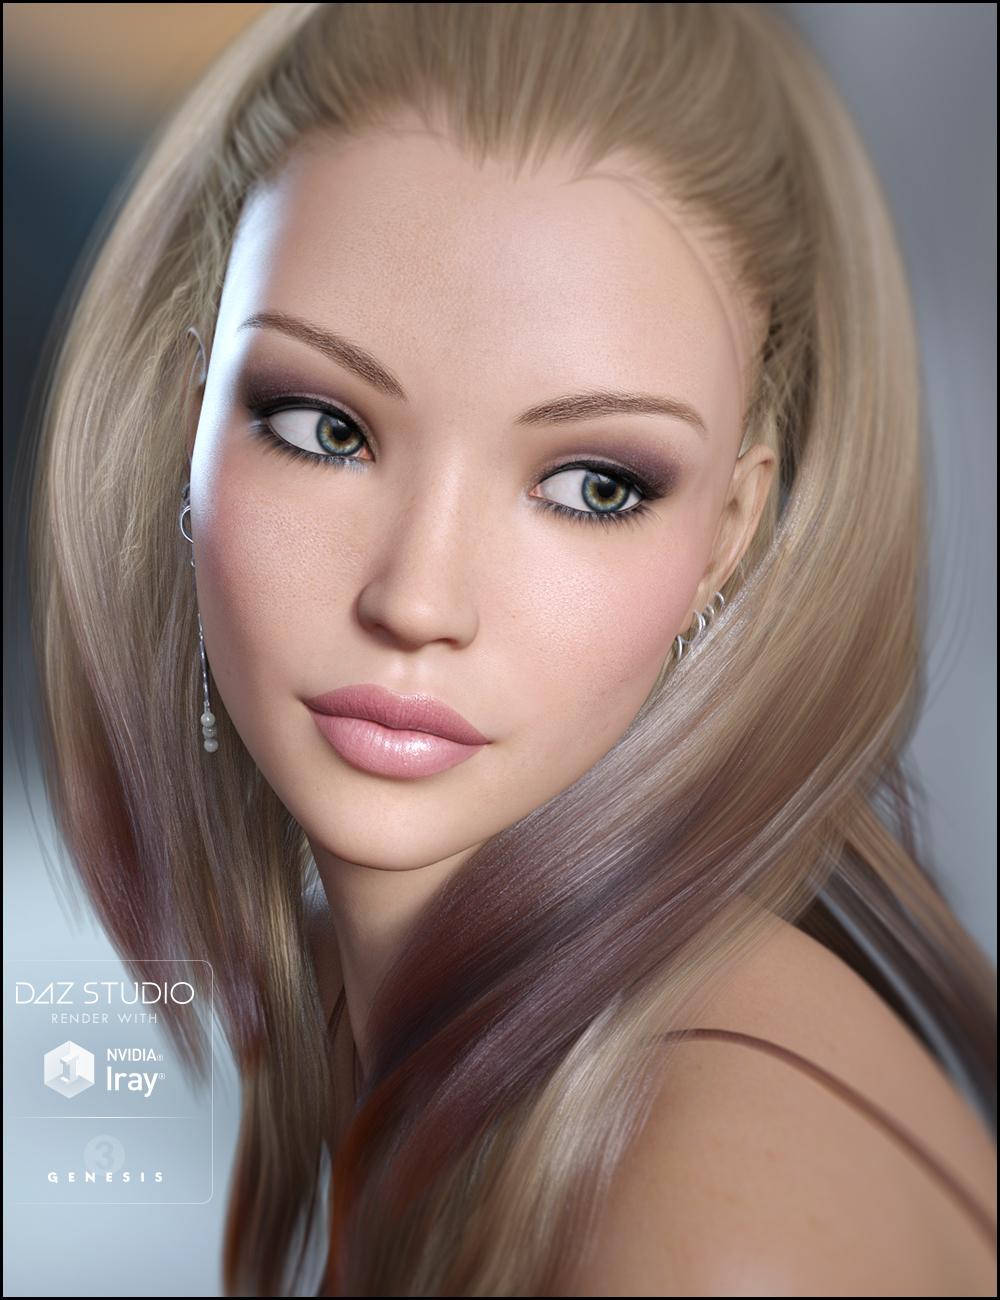 Brittany for Genesis 3 Female(s) by: JessaiiDemonicaEvilius, 3D Models by Daz 3D